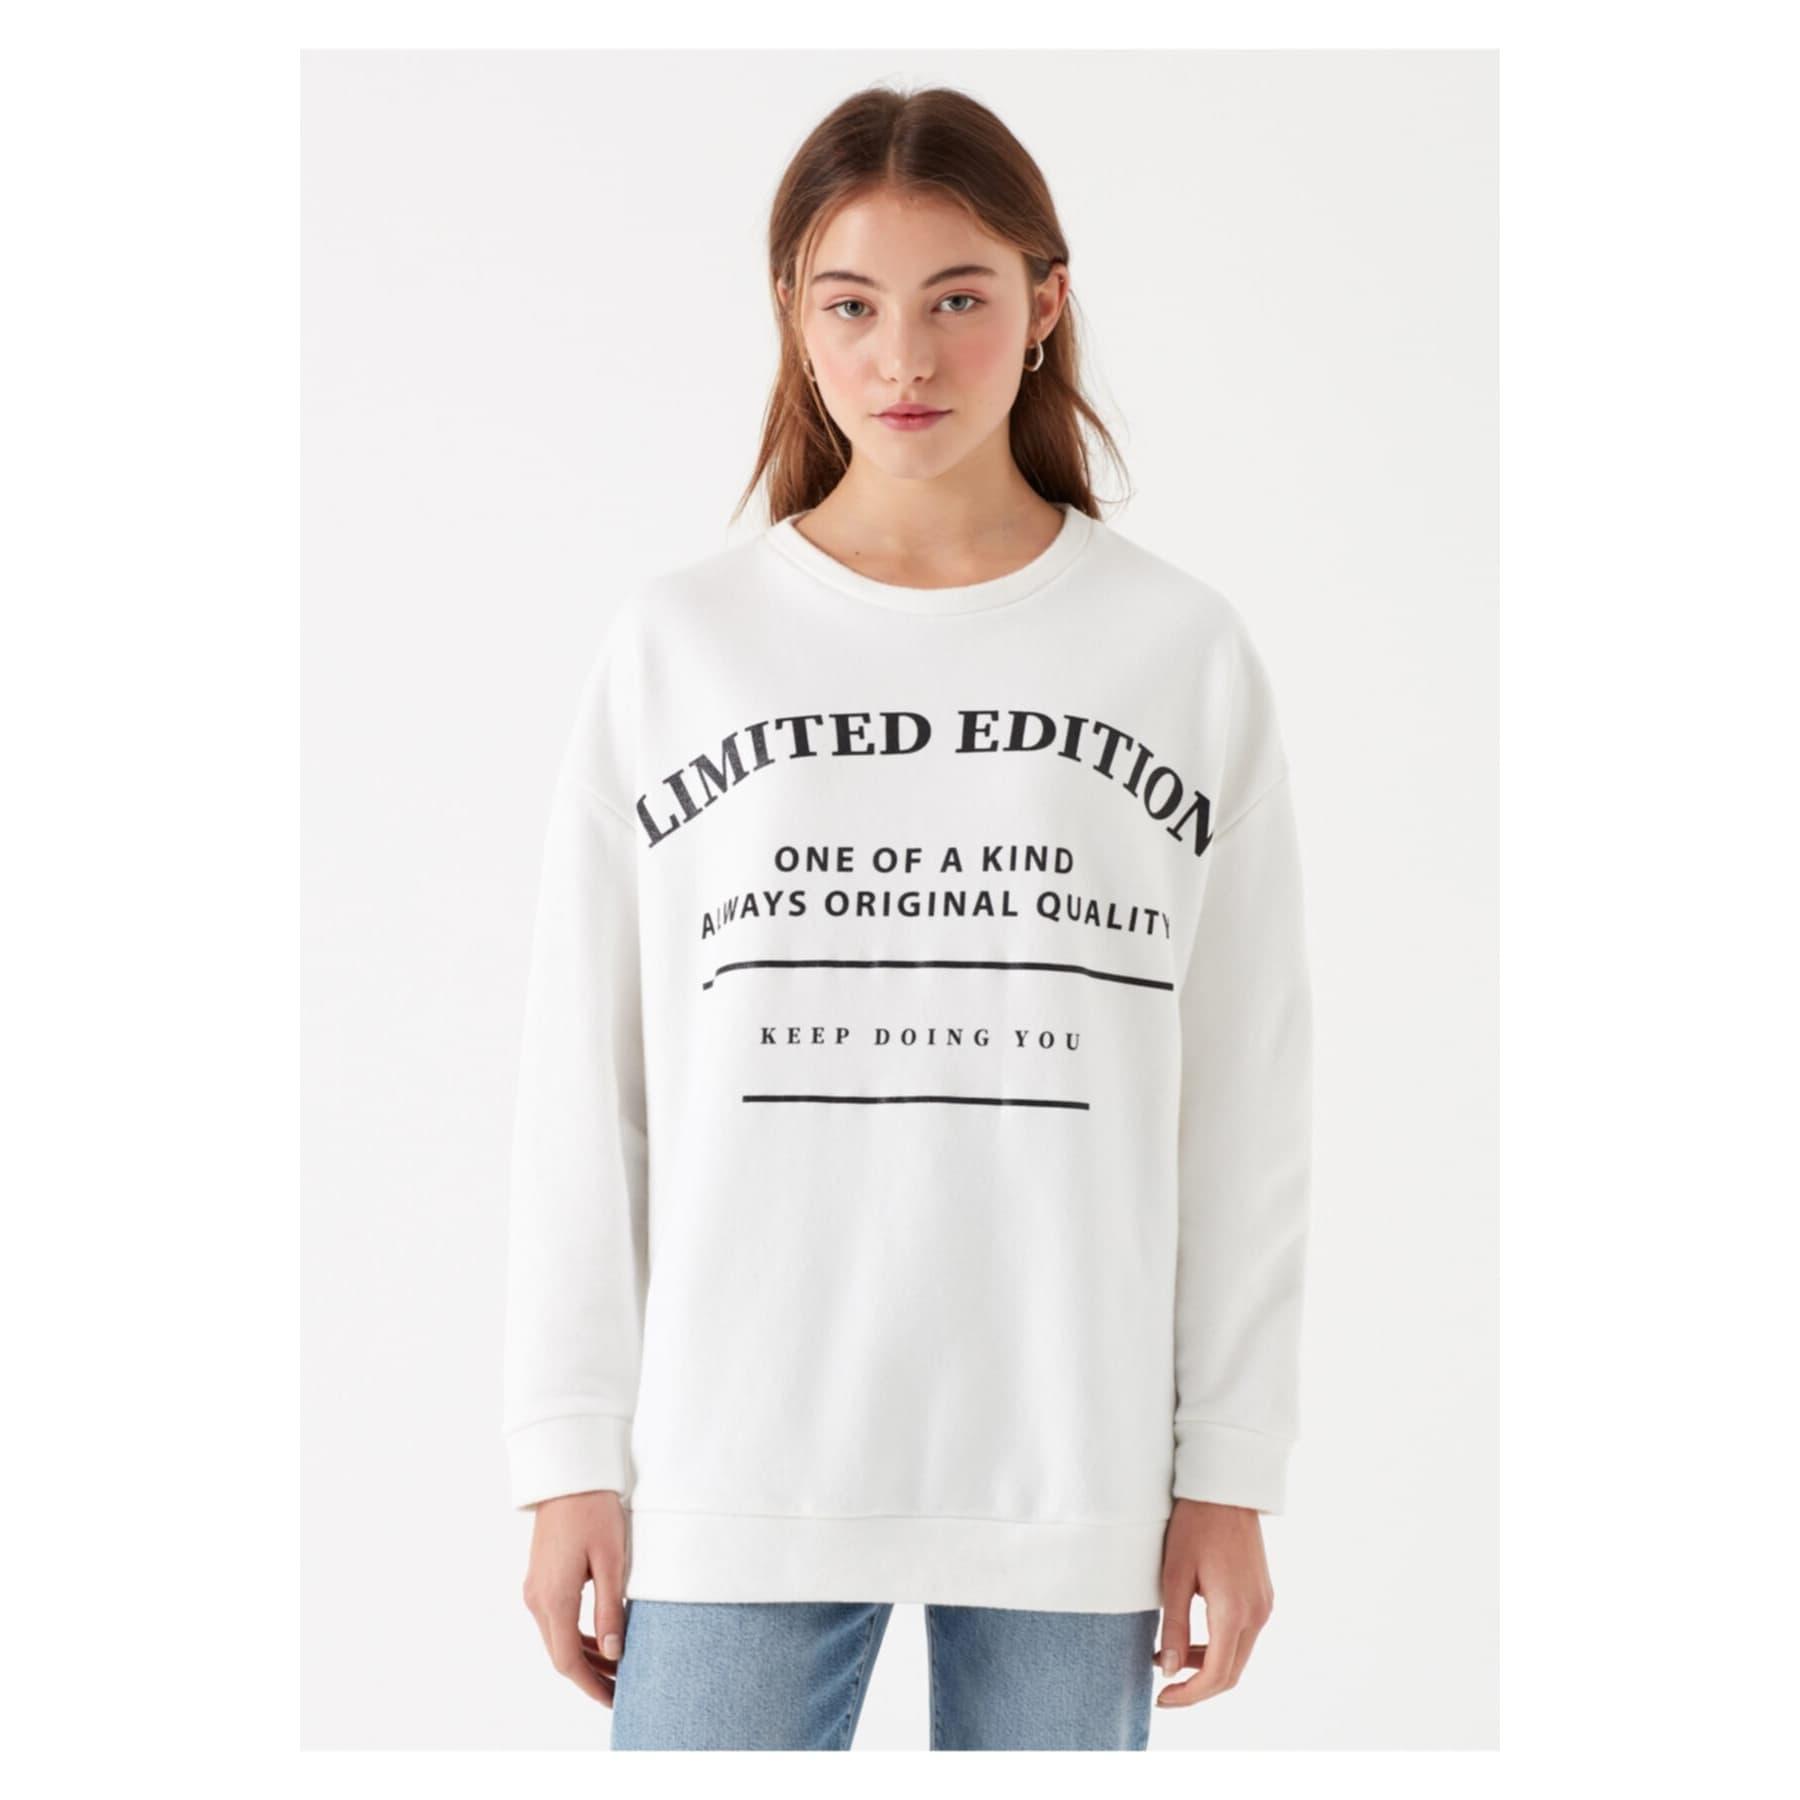 Limited Edition Baskılı Beyaz Sweatshirt (168548-620)